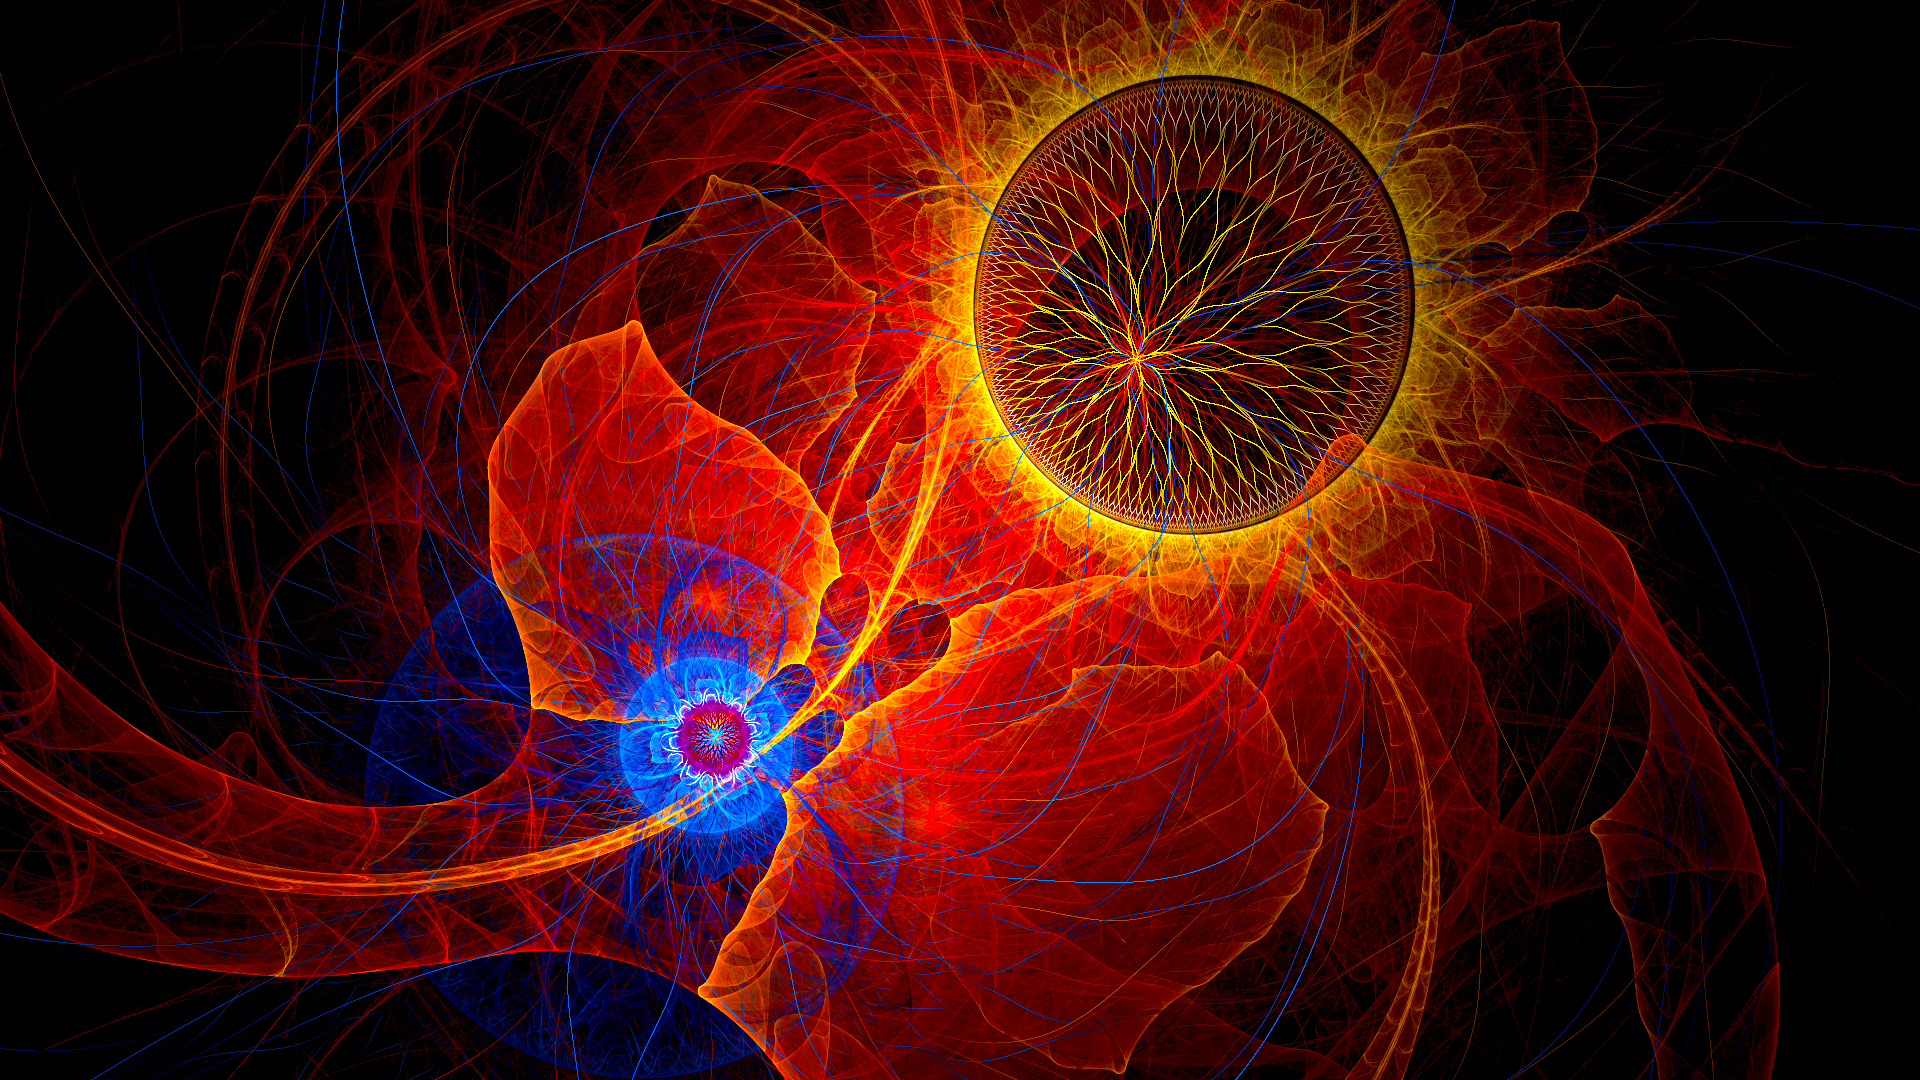 The+Birth+Of+A+Sun+II+by+Fractamonium.deviantart.com+on+@DeviantArt